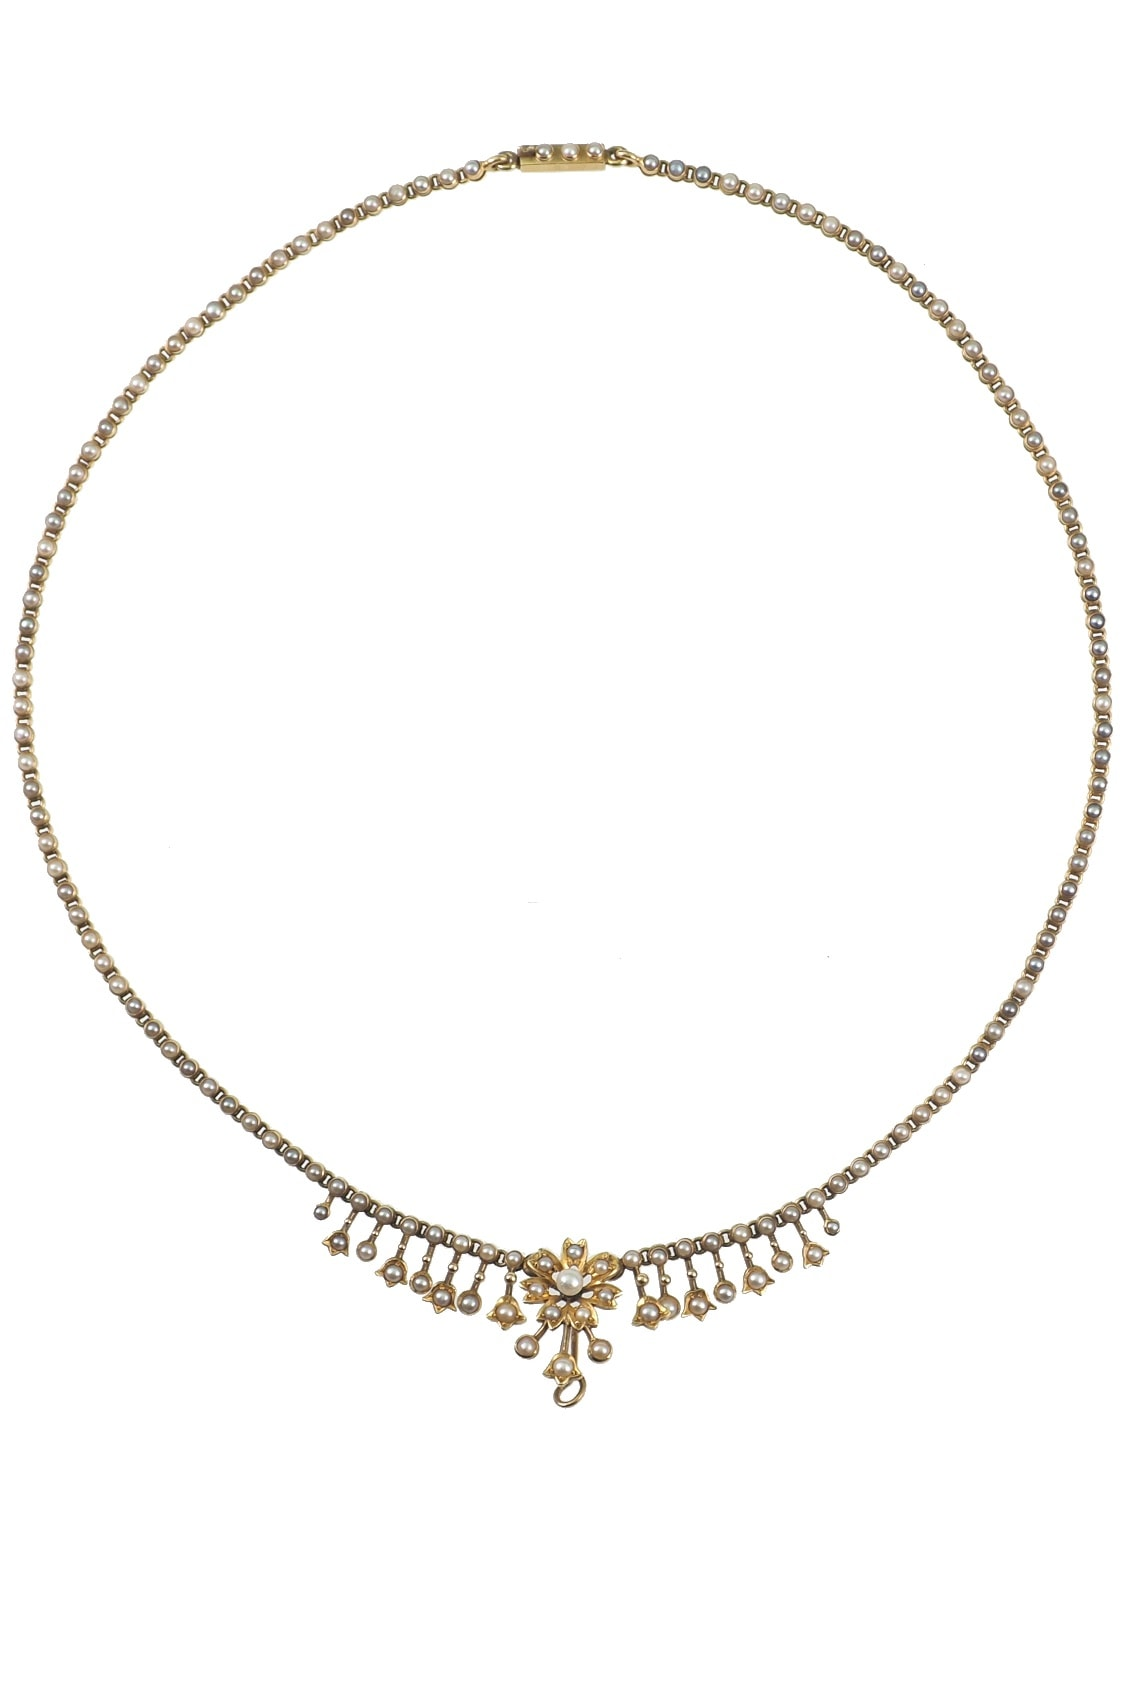 antike-Goldcolliers-kaufen-0653b